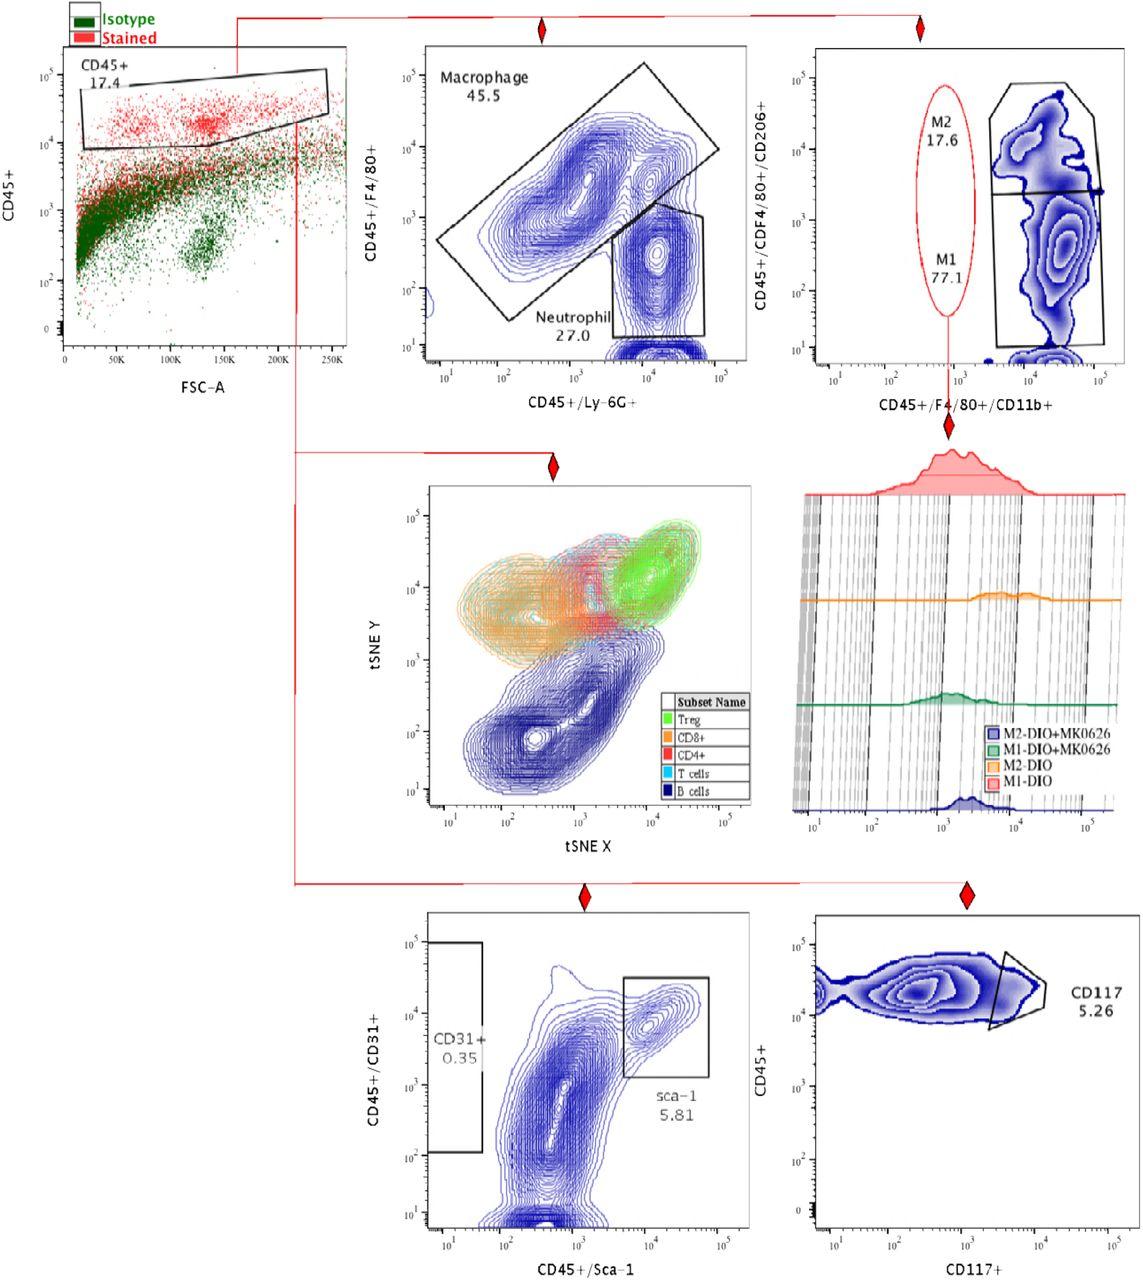 Dipeptidyl dipeptidase-4 inhibitor, MK-0626, promotes bone marrow